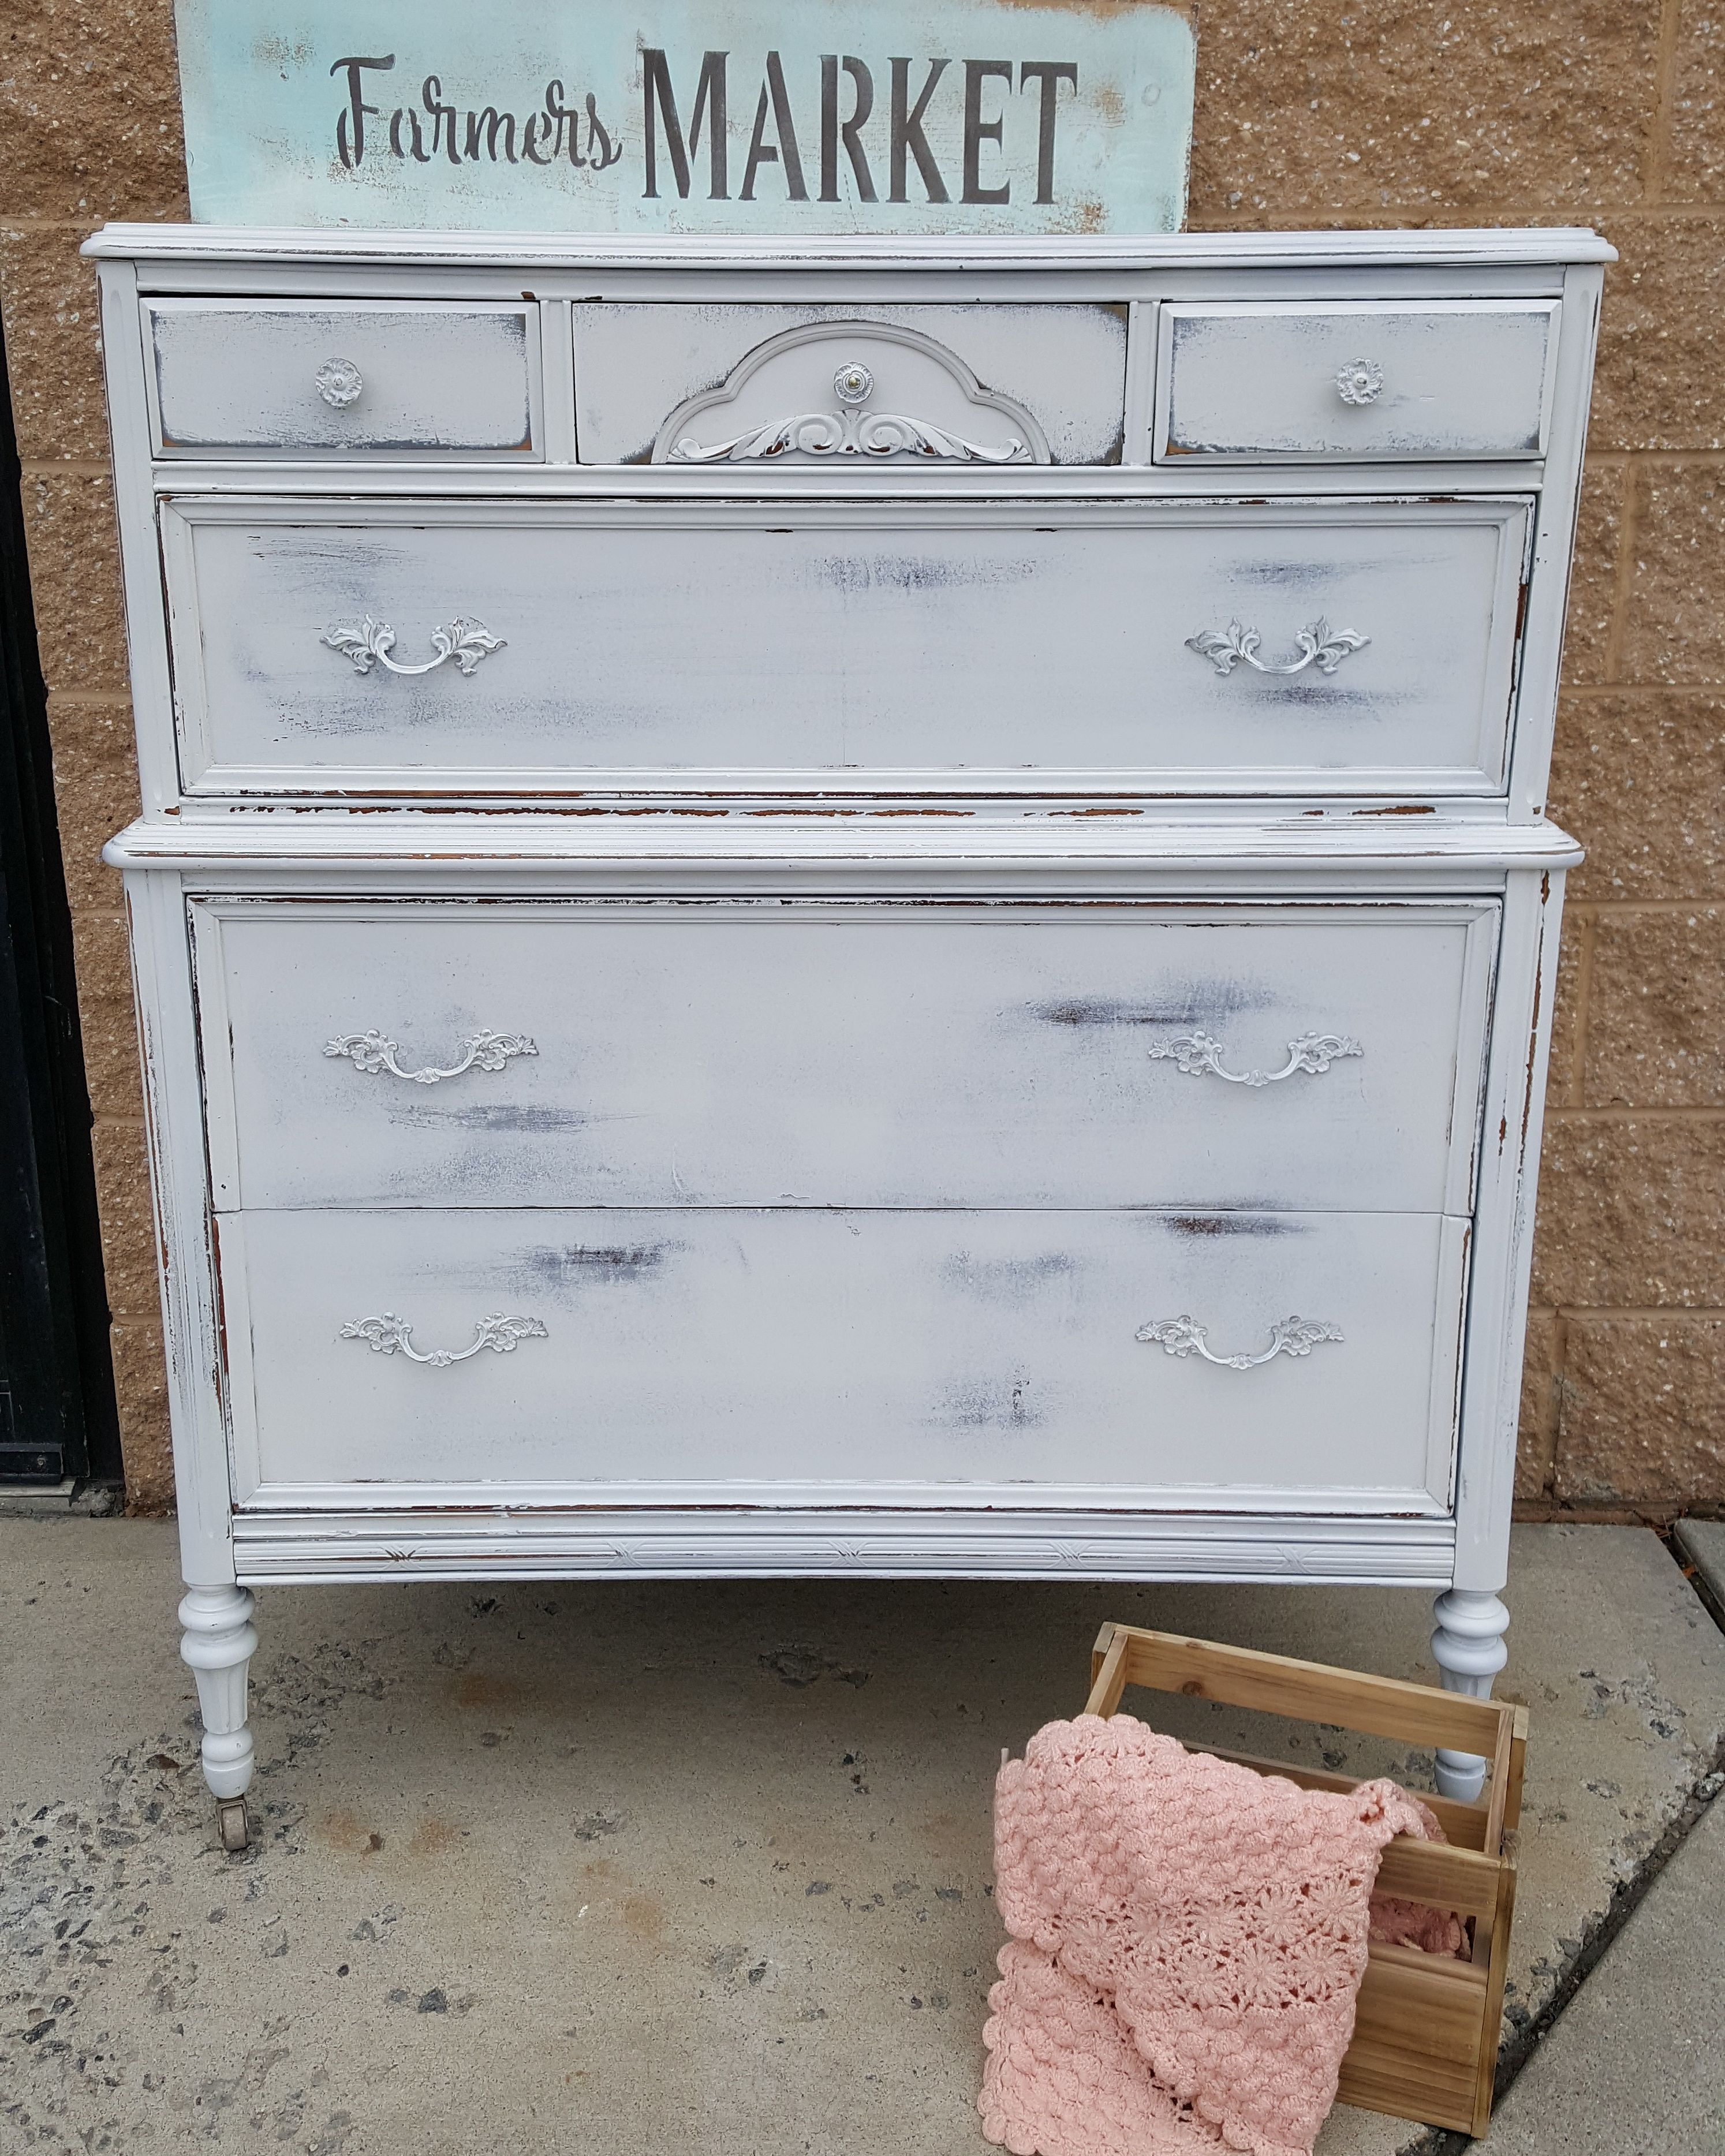 Vintage Dresser With Gray Undertone And White Top Coat Vintagefurniture Paintedfurniture Diy Repurposed Shabby Chic Dresser Shabby Chic Revamp Furniture